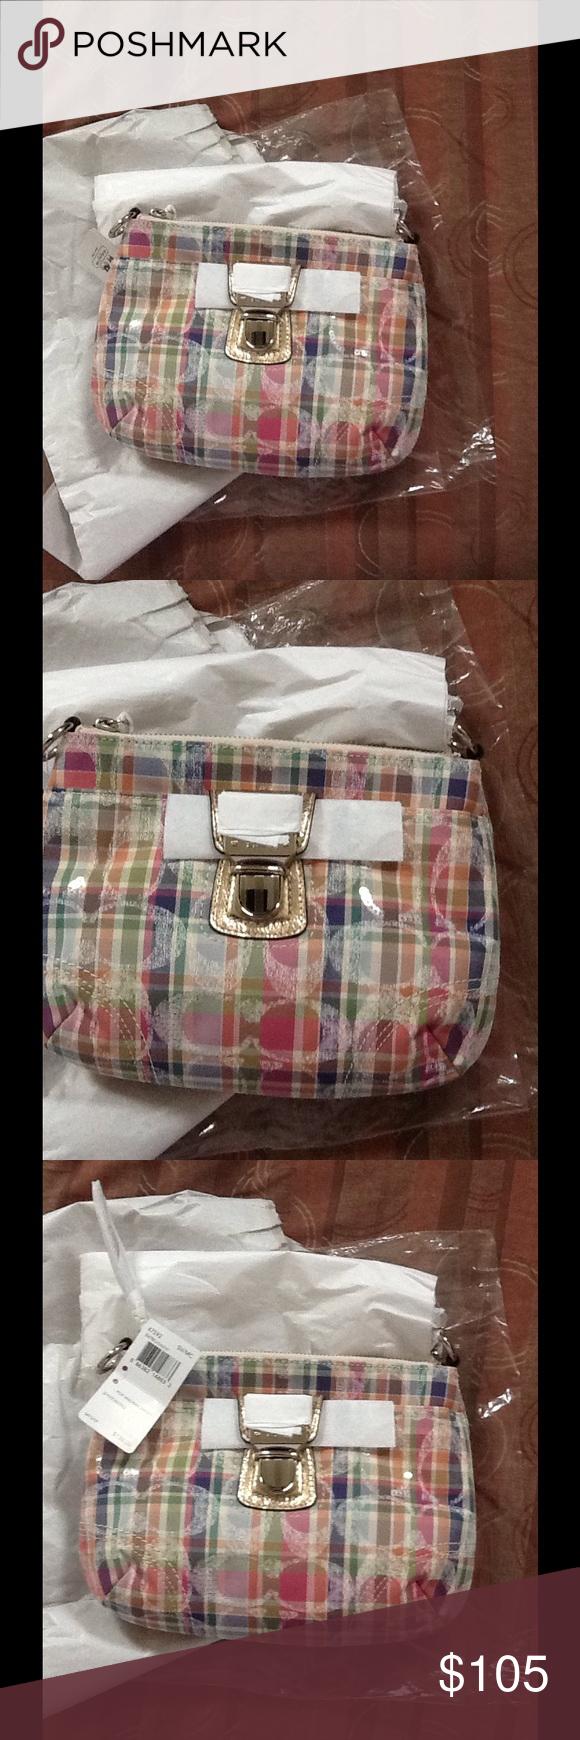 Coach Poppy Madras Swingpack Crossbody Coach Swingpack. Push lock hardware   amp  gilded metallic accents 22b9de12da75f